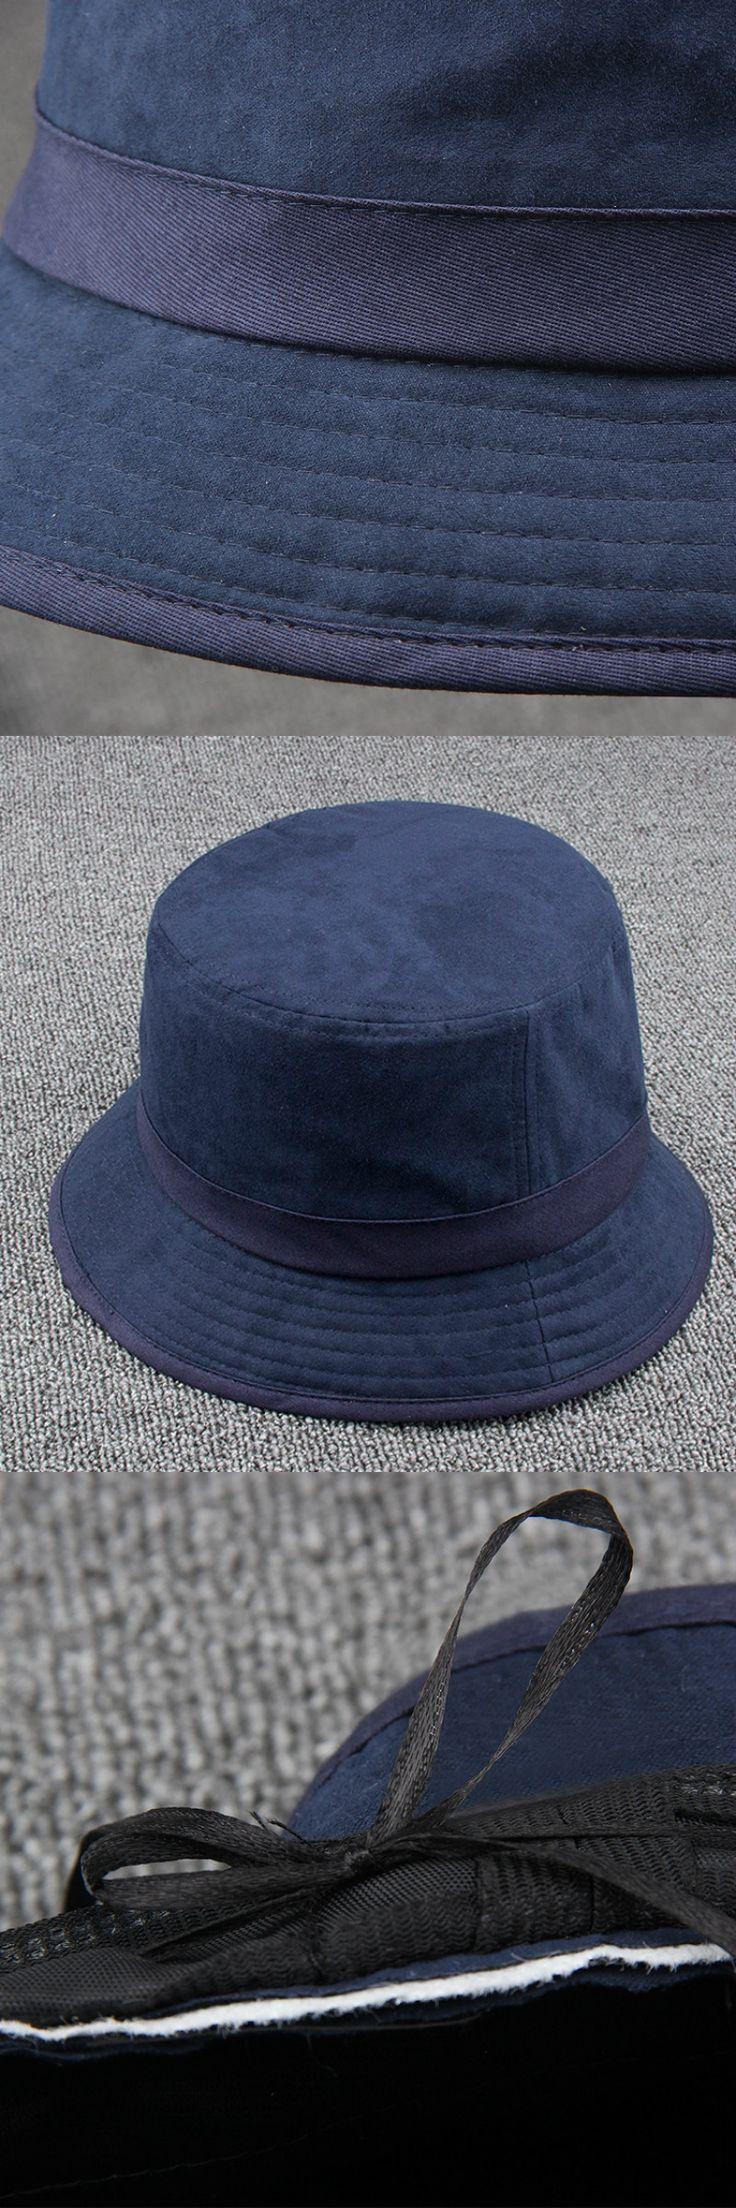 LeucosTicte 2017 New Men's Bucket Hats Wide Brim Cotton Hat UV Protection Cap Men Bob sun Protection Fisherman Hats For Men